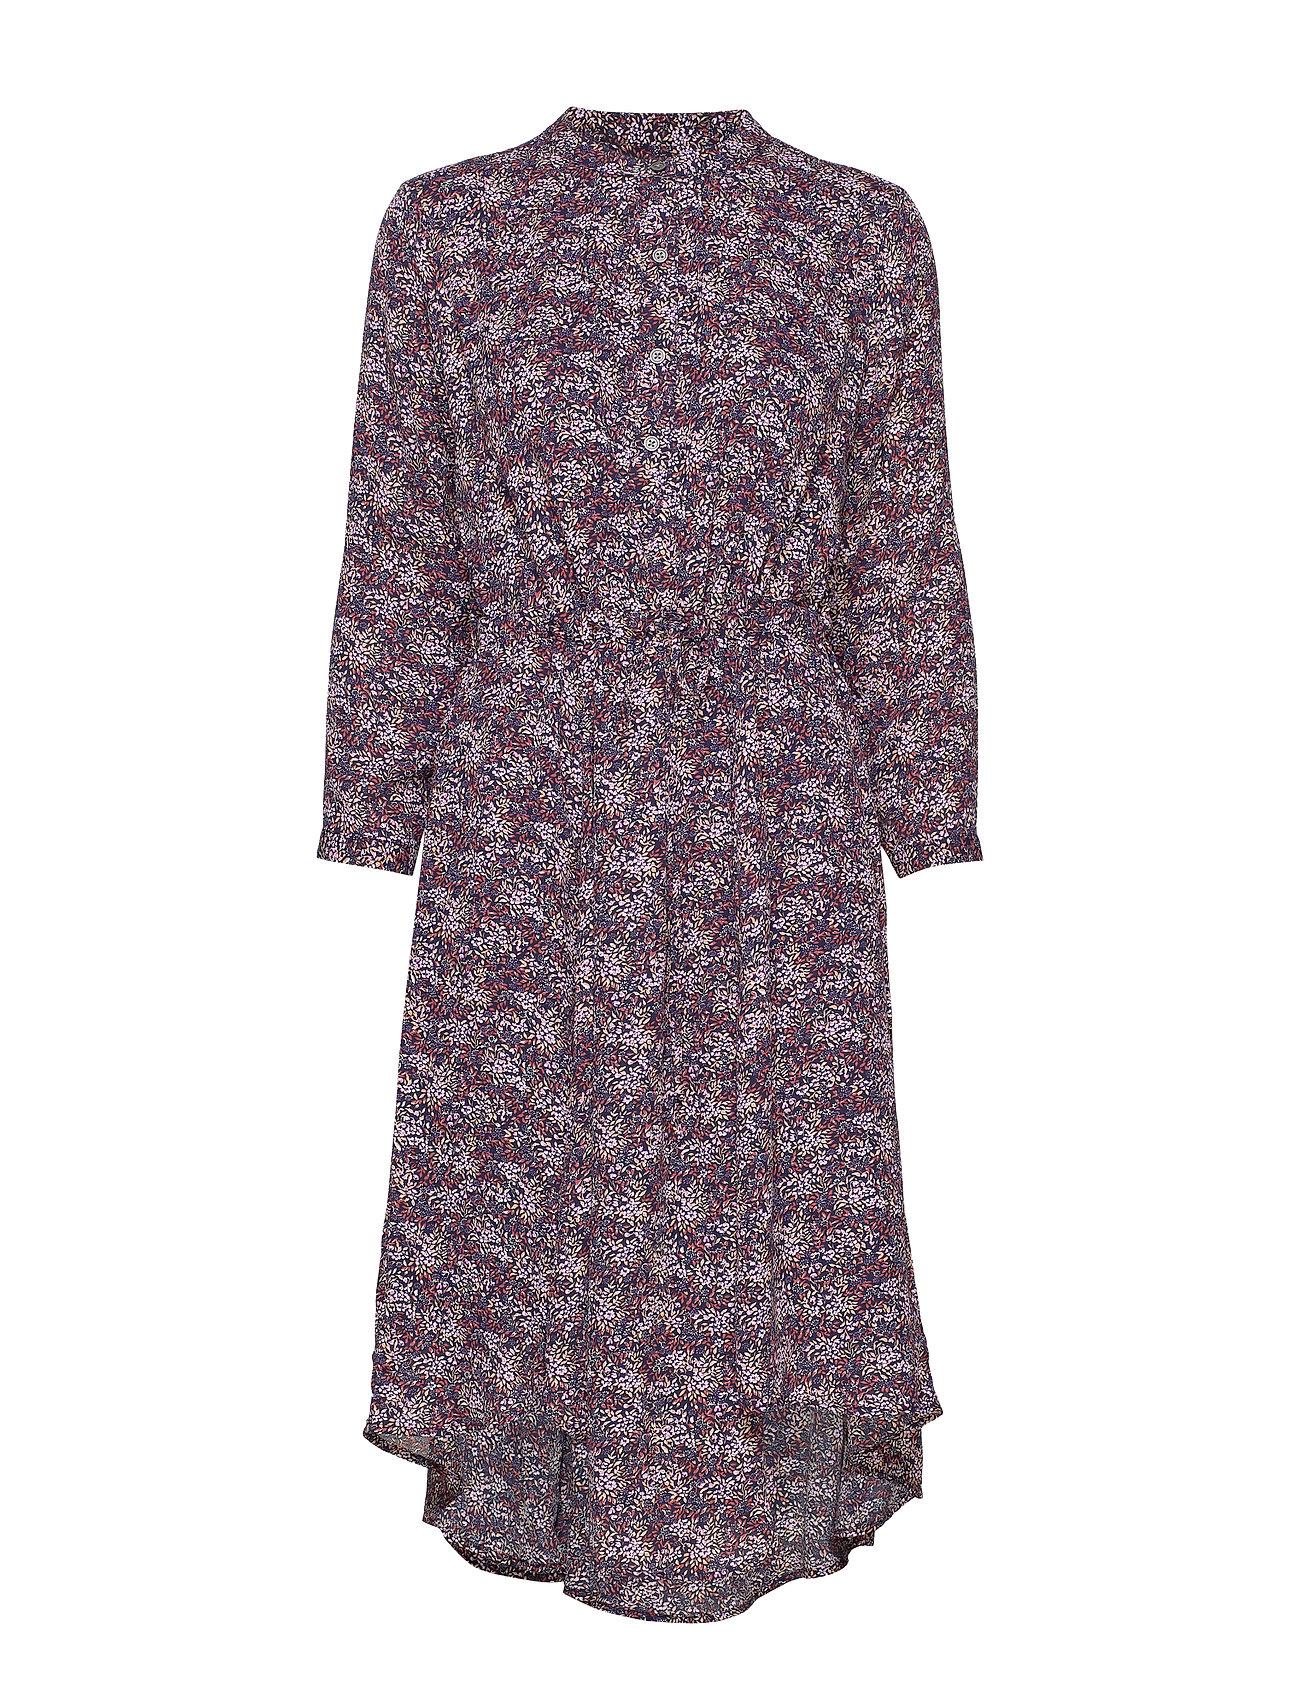 GAP Floral Print Midi Shirtdress - NAVY FLORAL